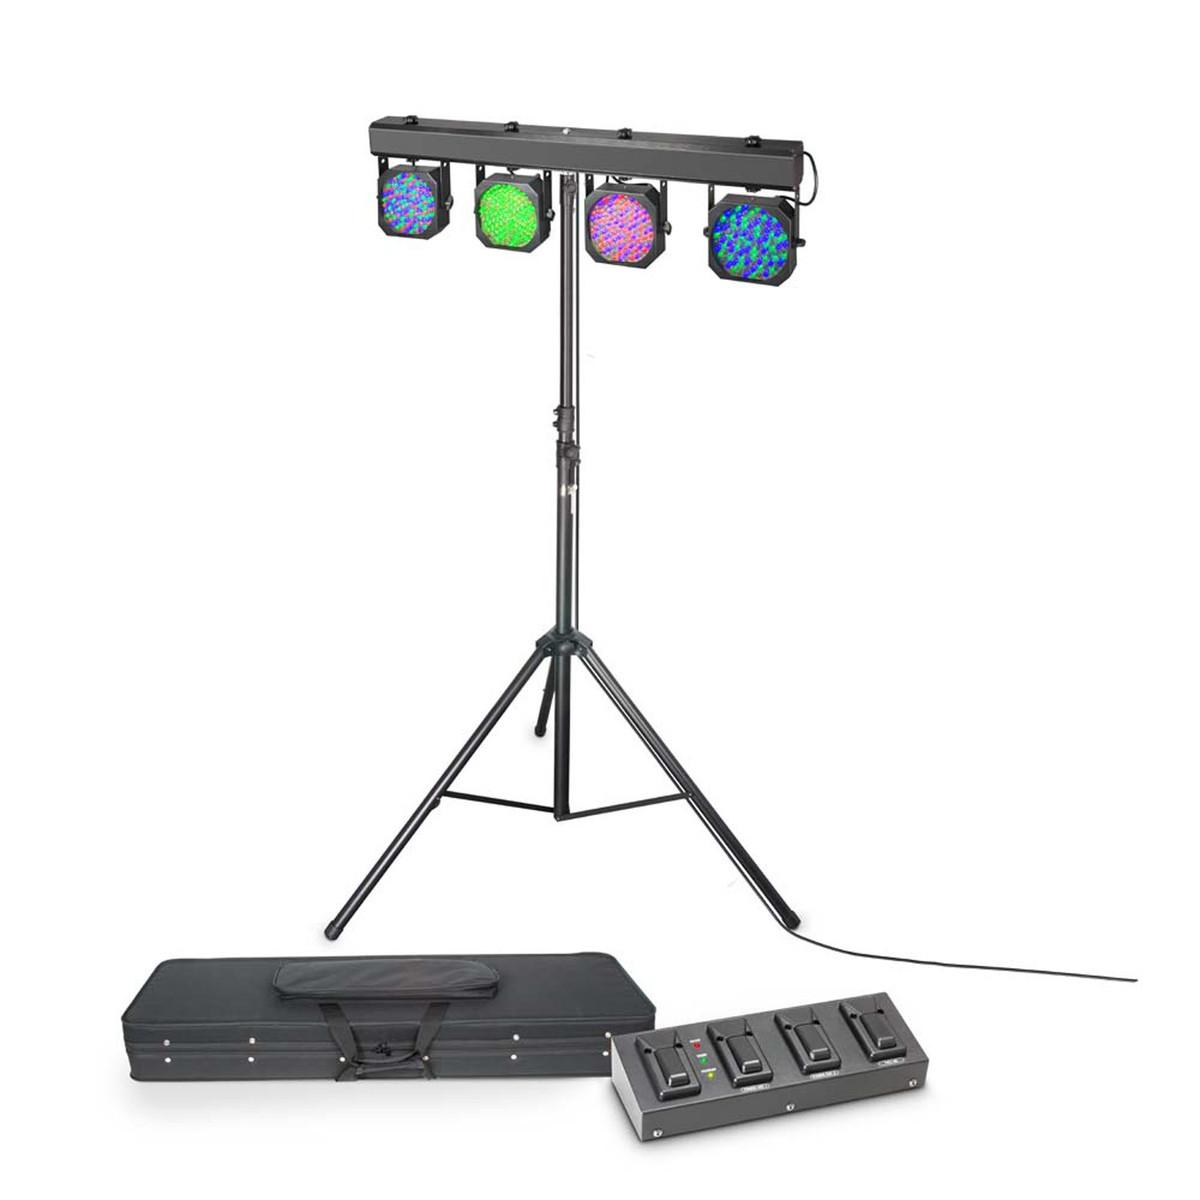 Image of Cameo Multi Par 1 Set 432 x 10mm LED Lighting System with Case